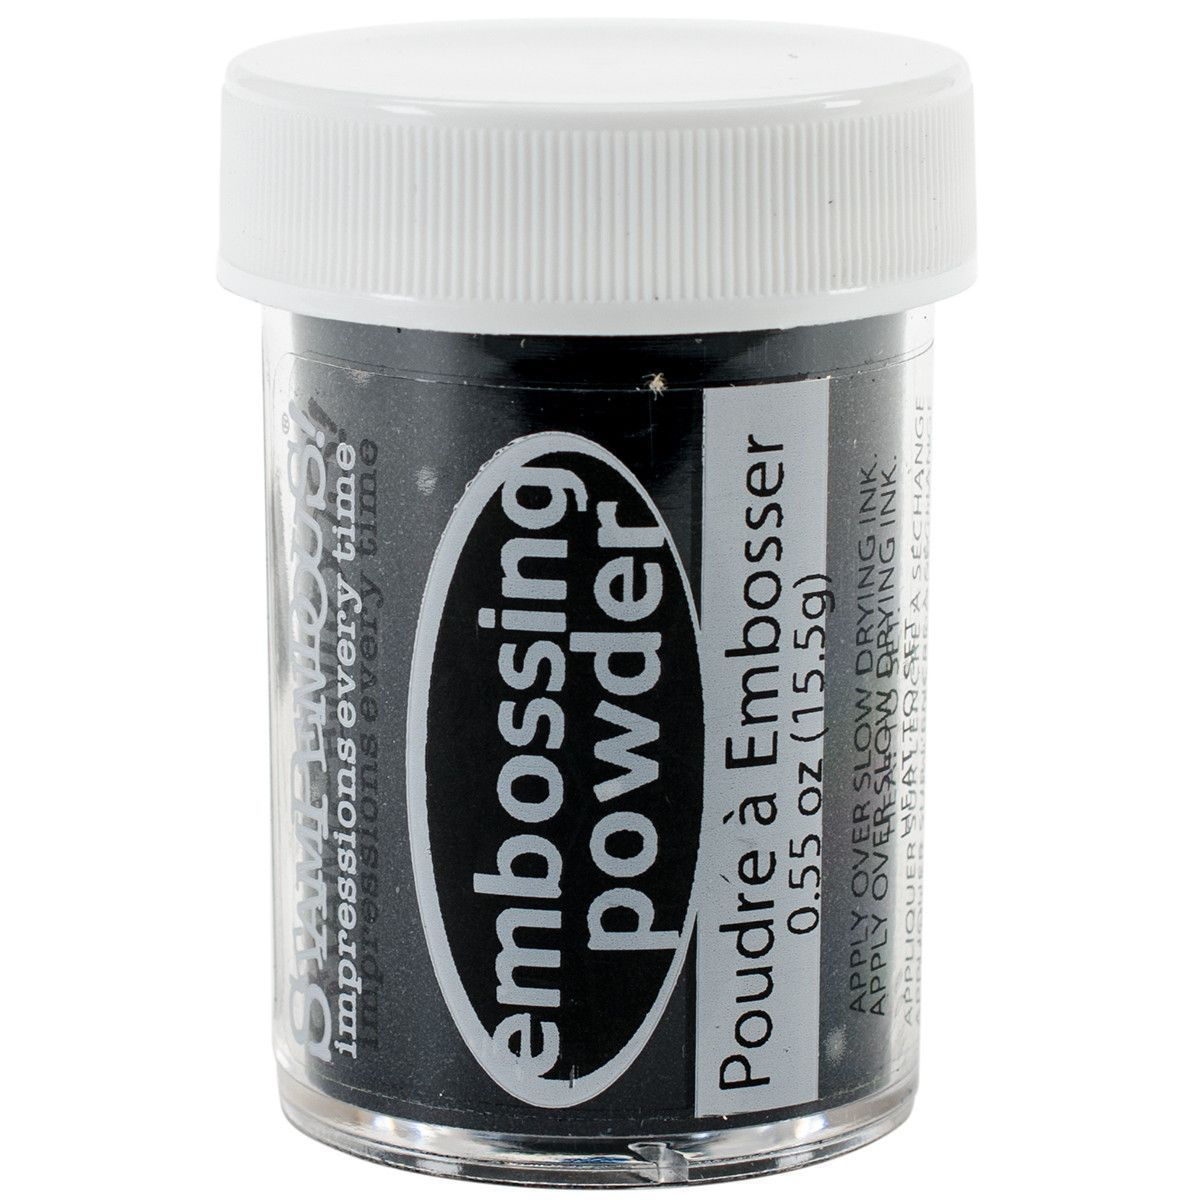 Stamp-N Stuff Detail Embossing Powder - Black Opaque